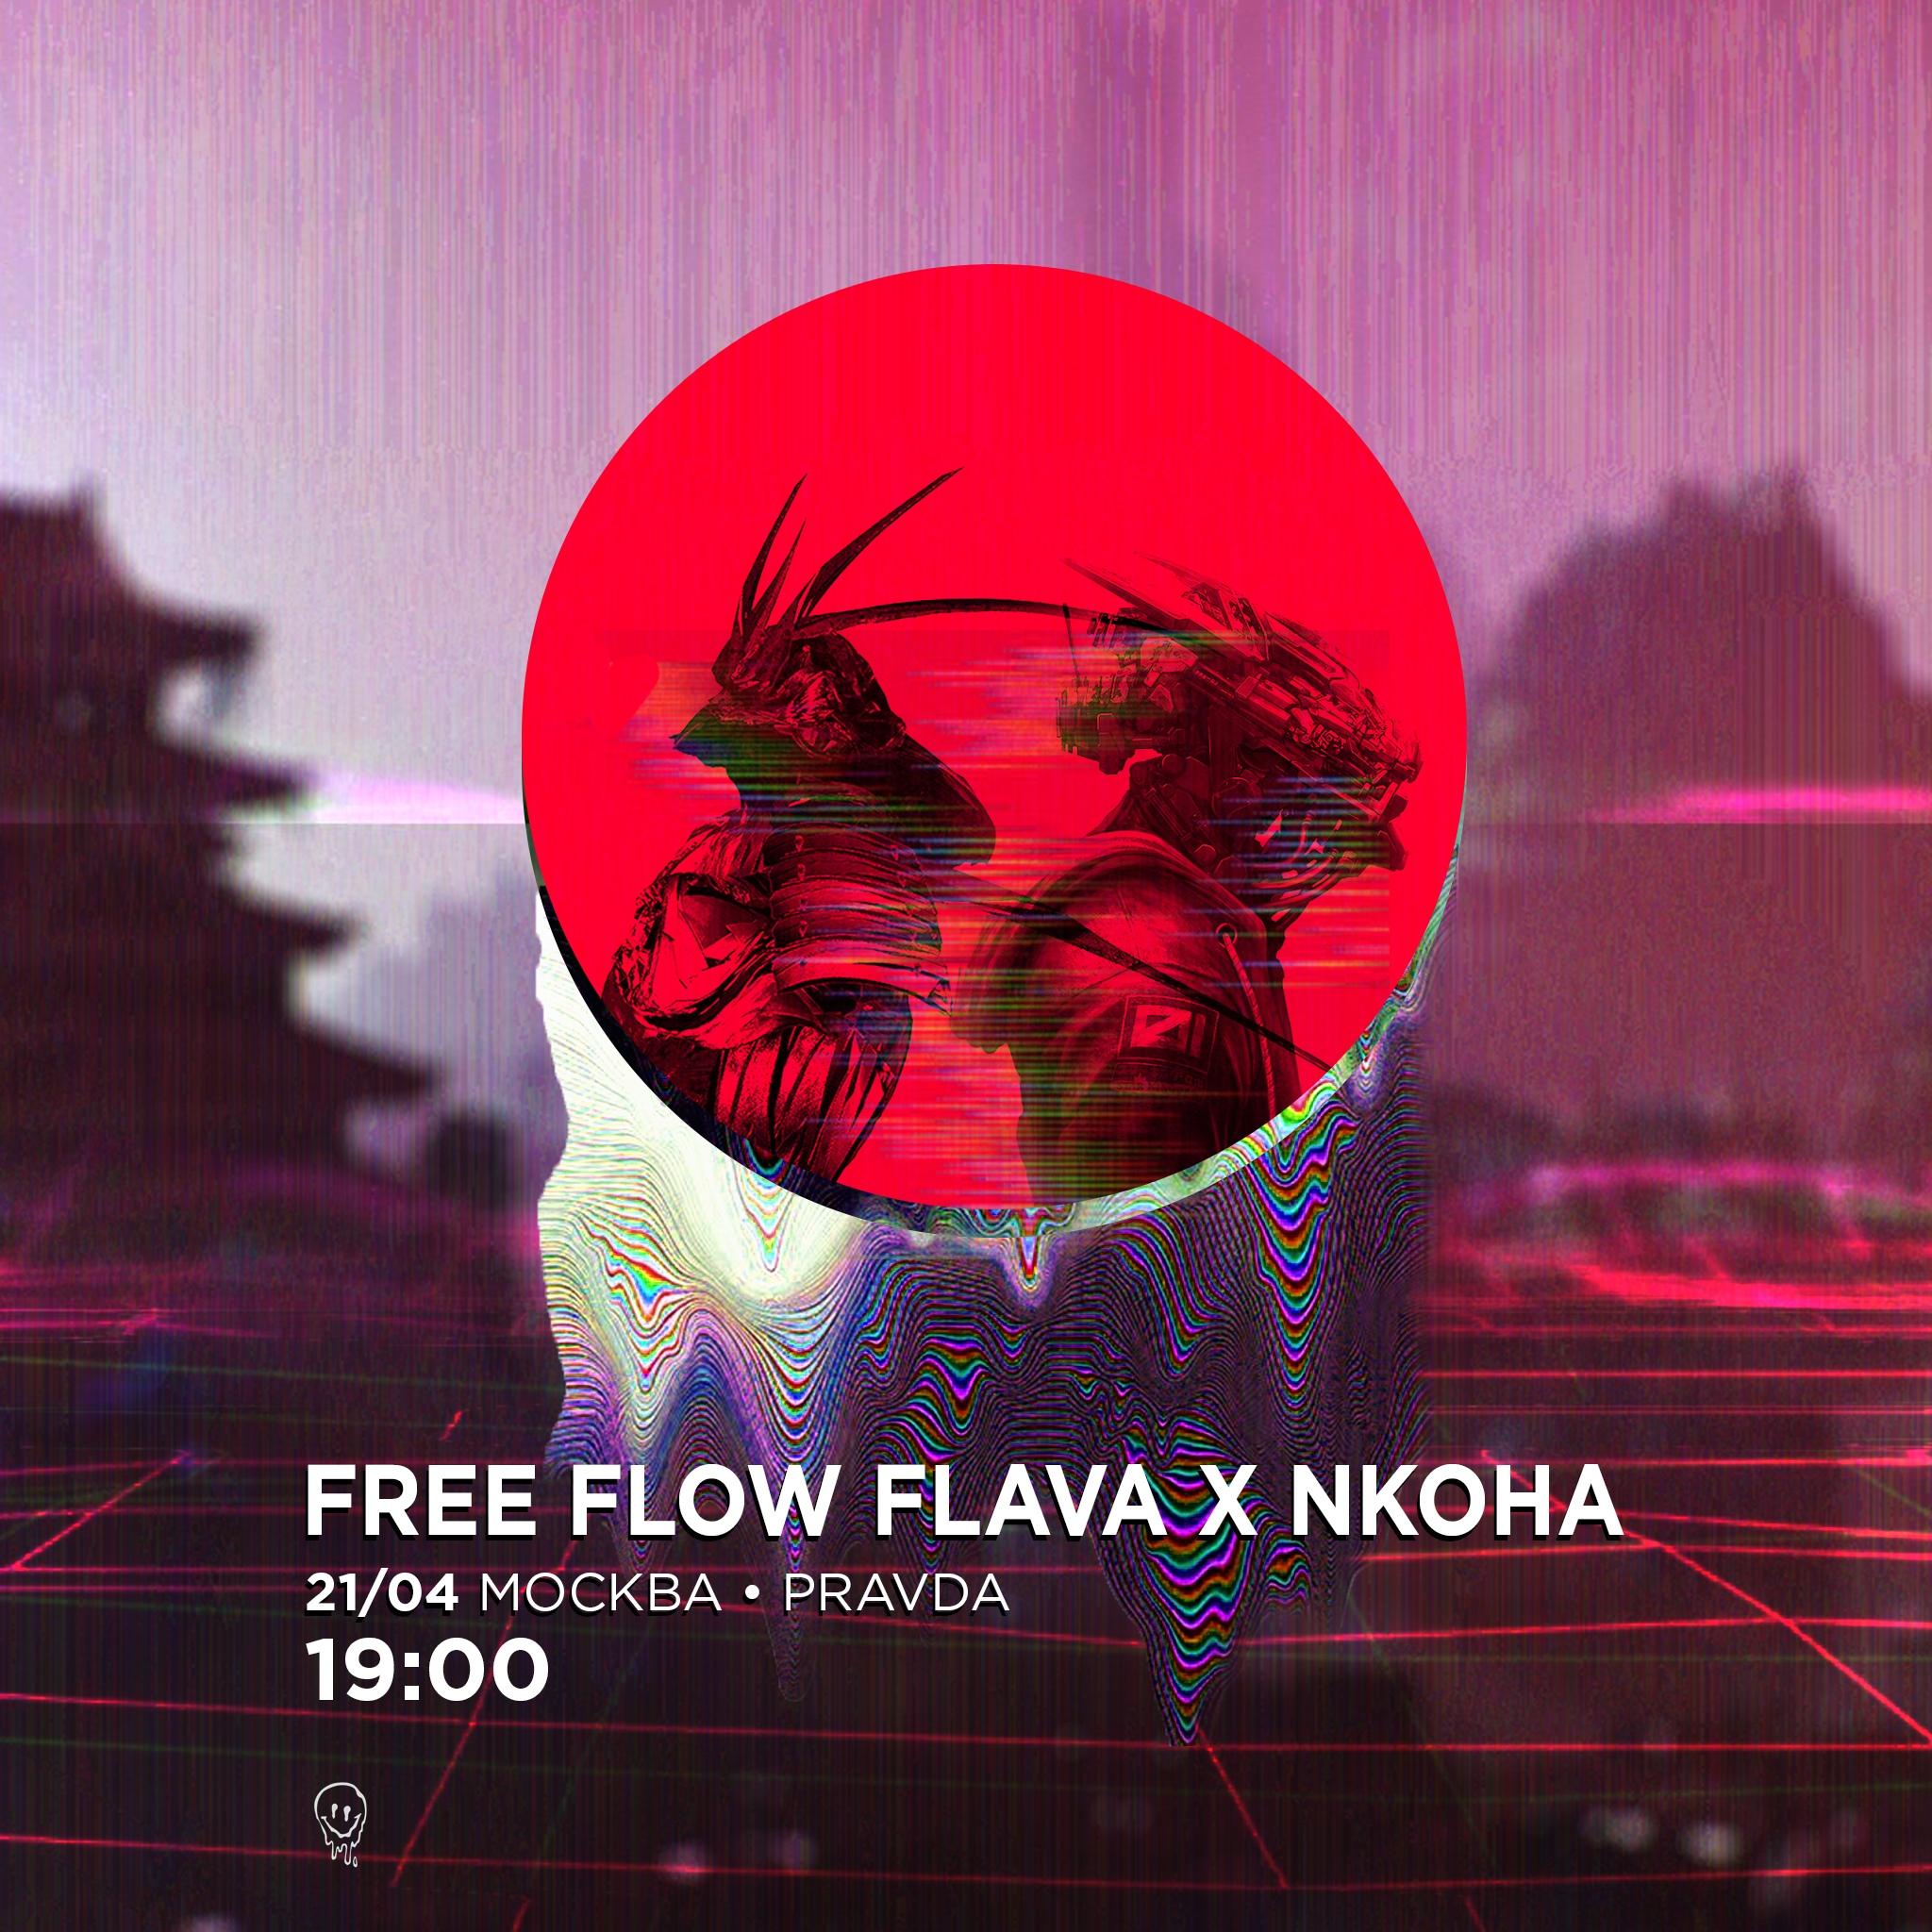 FREE FLOW FLAVA & NKOHA